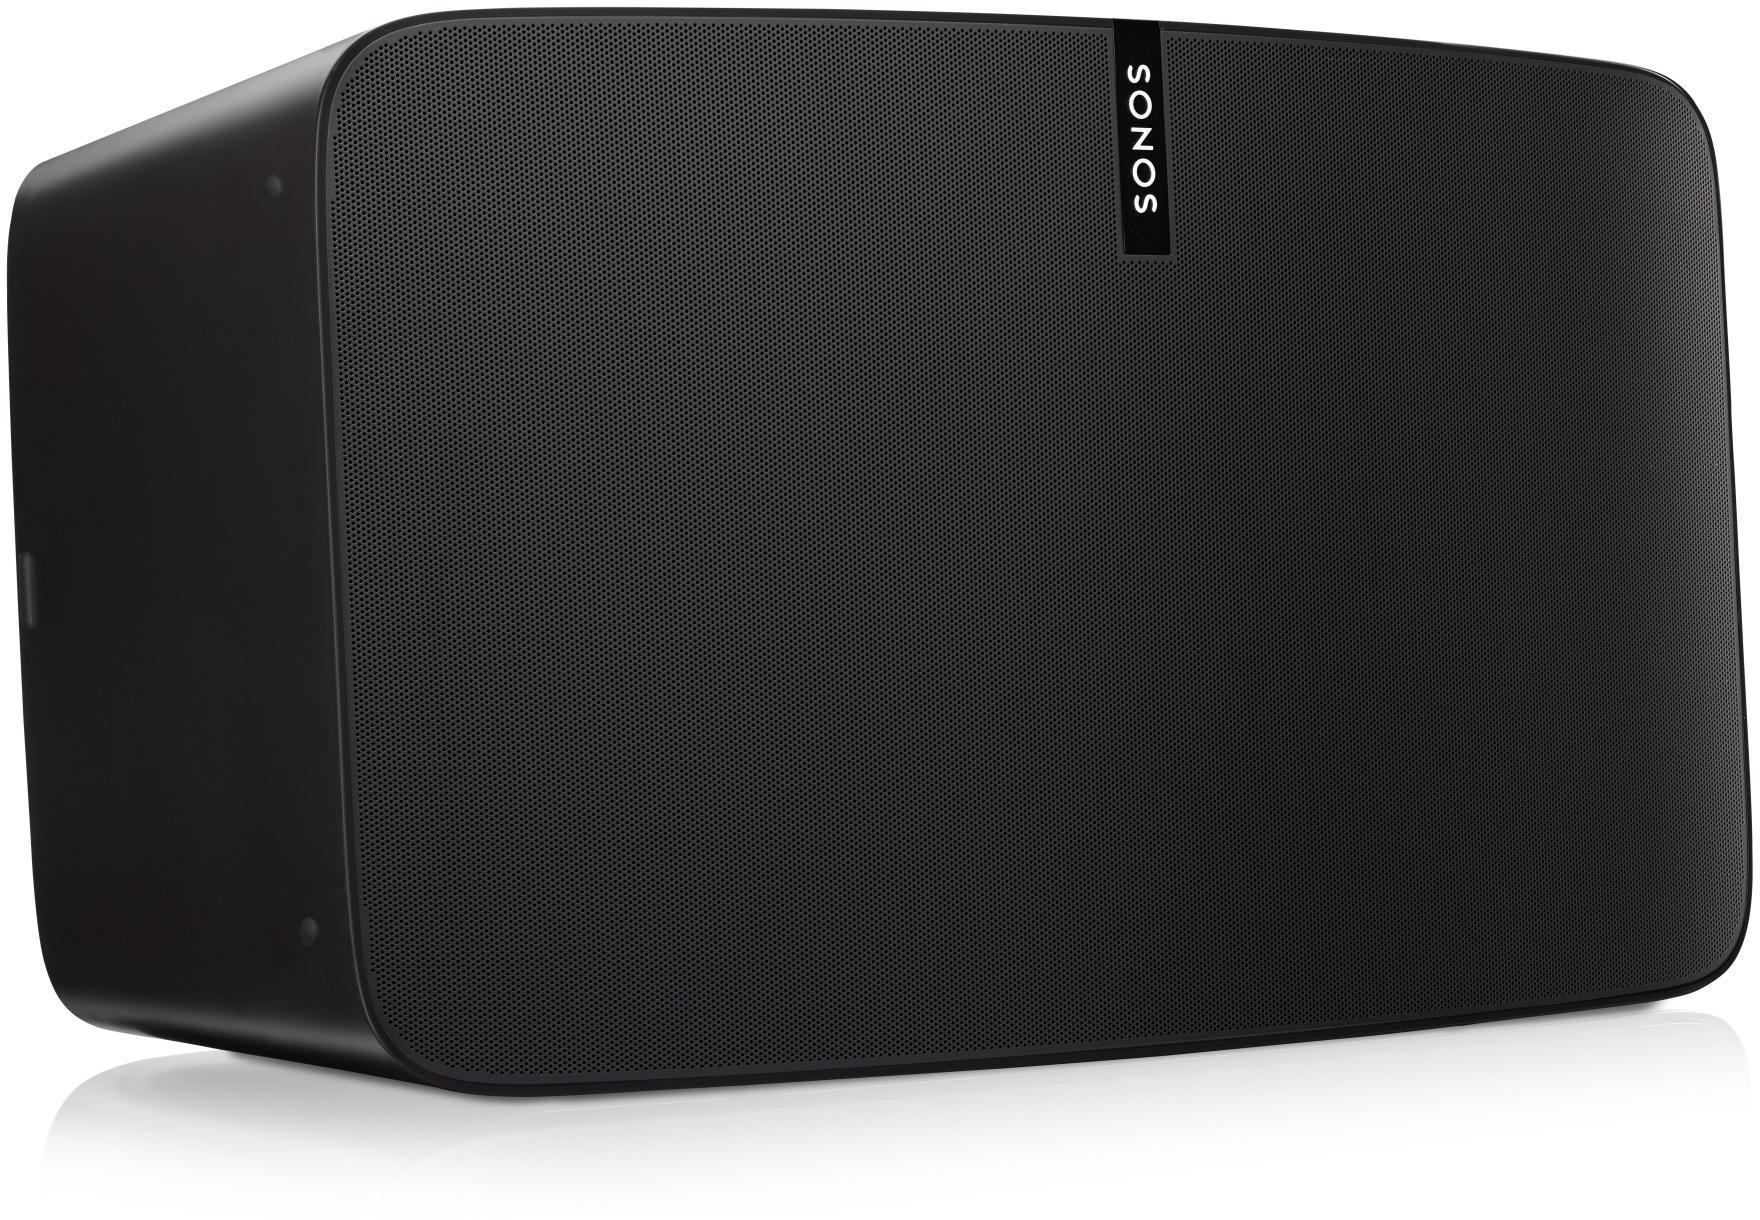 Sonos Play 5 Gen 2 resetten